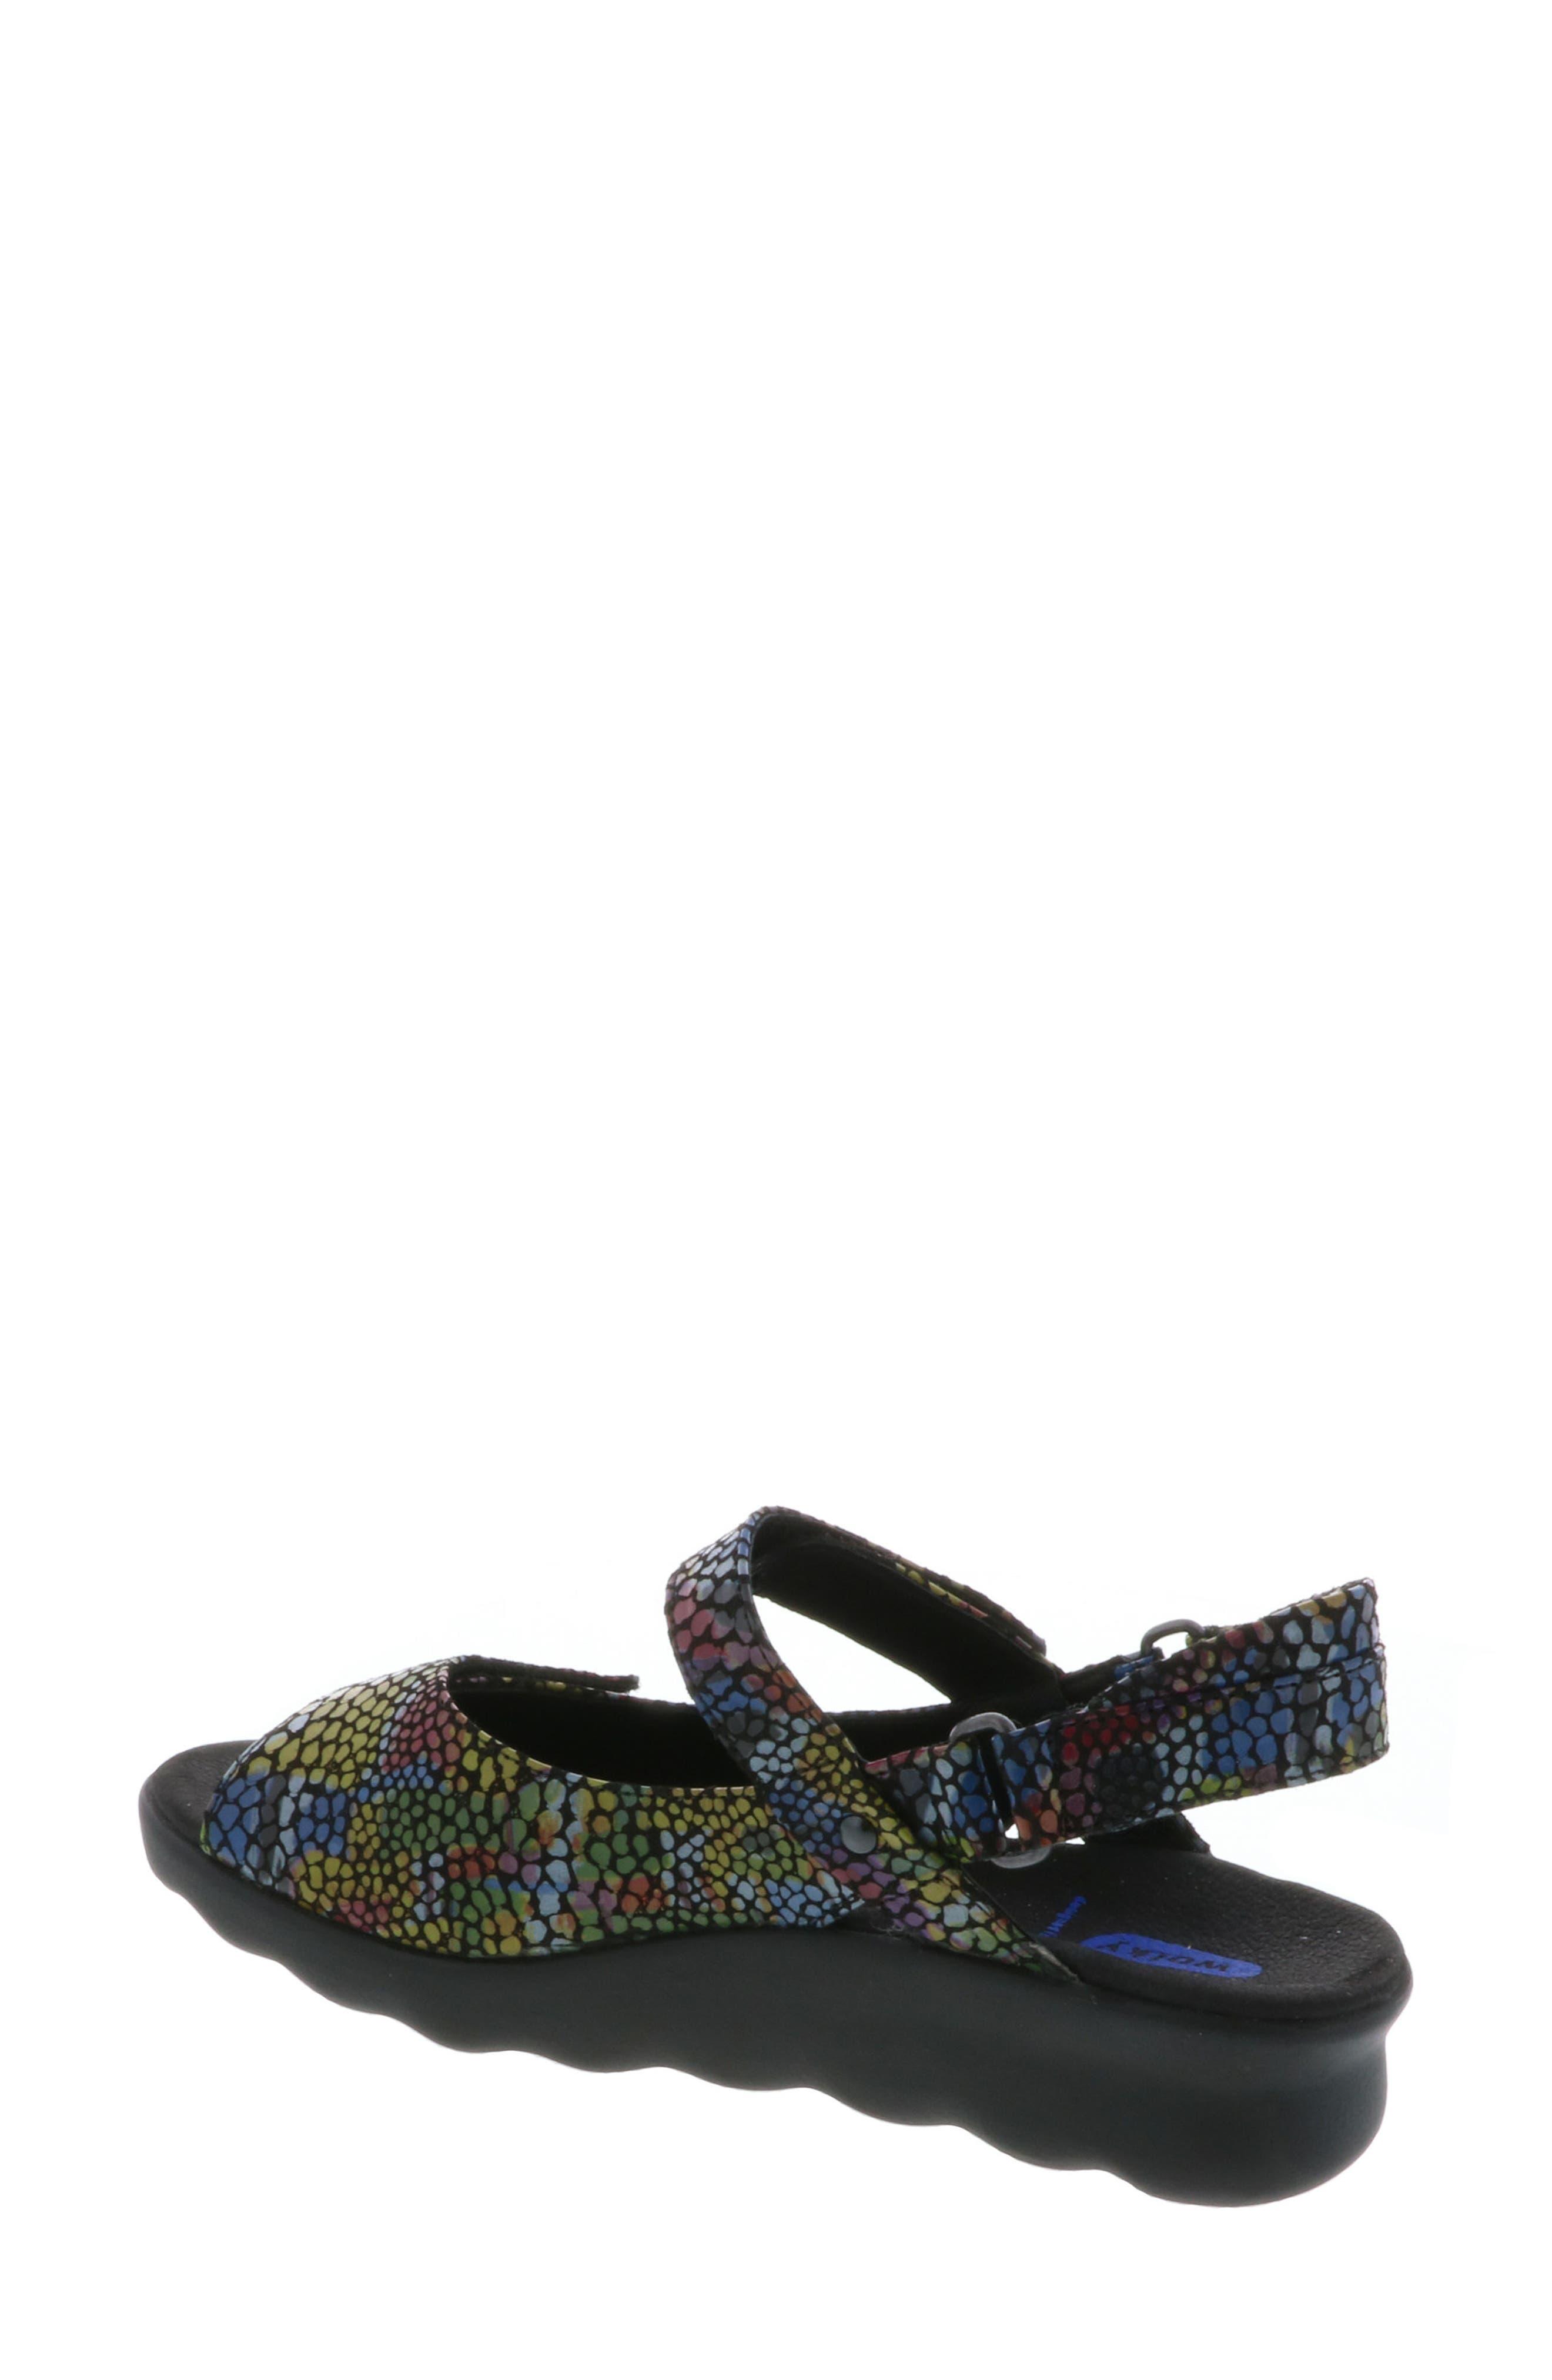 Pichu Quarter Strap Sandal,                             Alternate thumbnail 2, color,                             Black Multi Color Fantasy